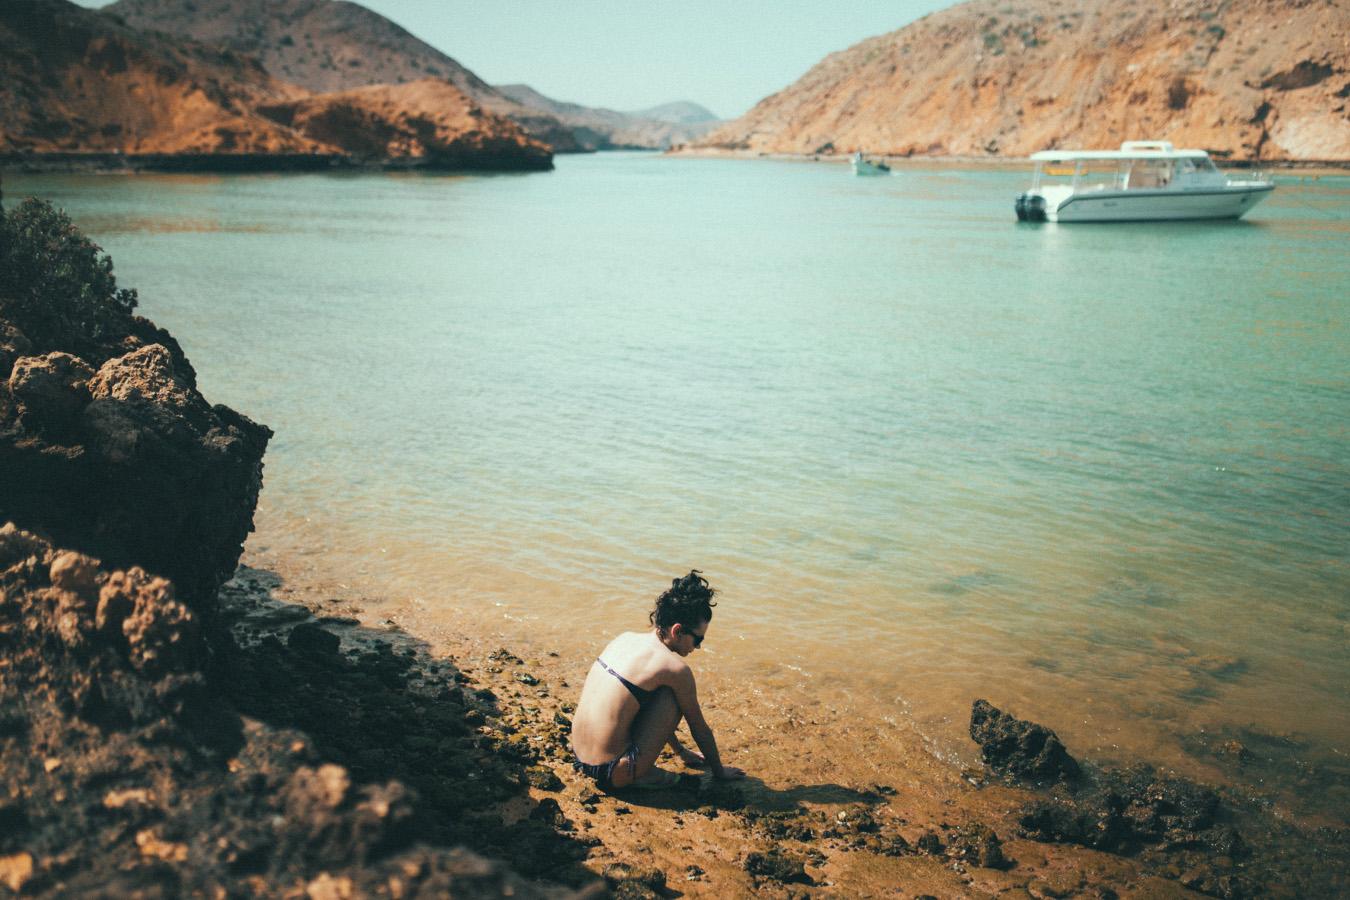 Bandar Al Khairan, Oman, ukryta zatoczka